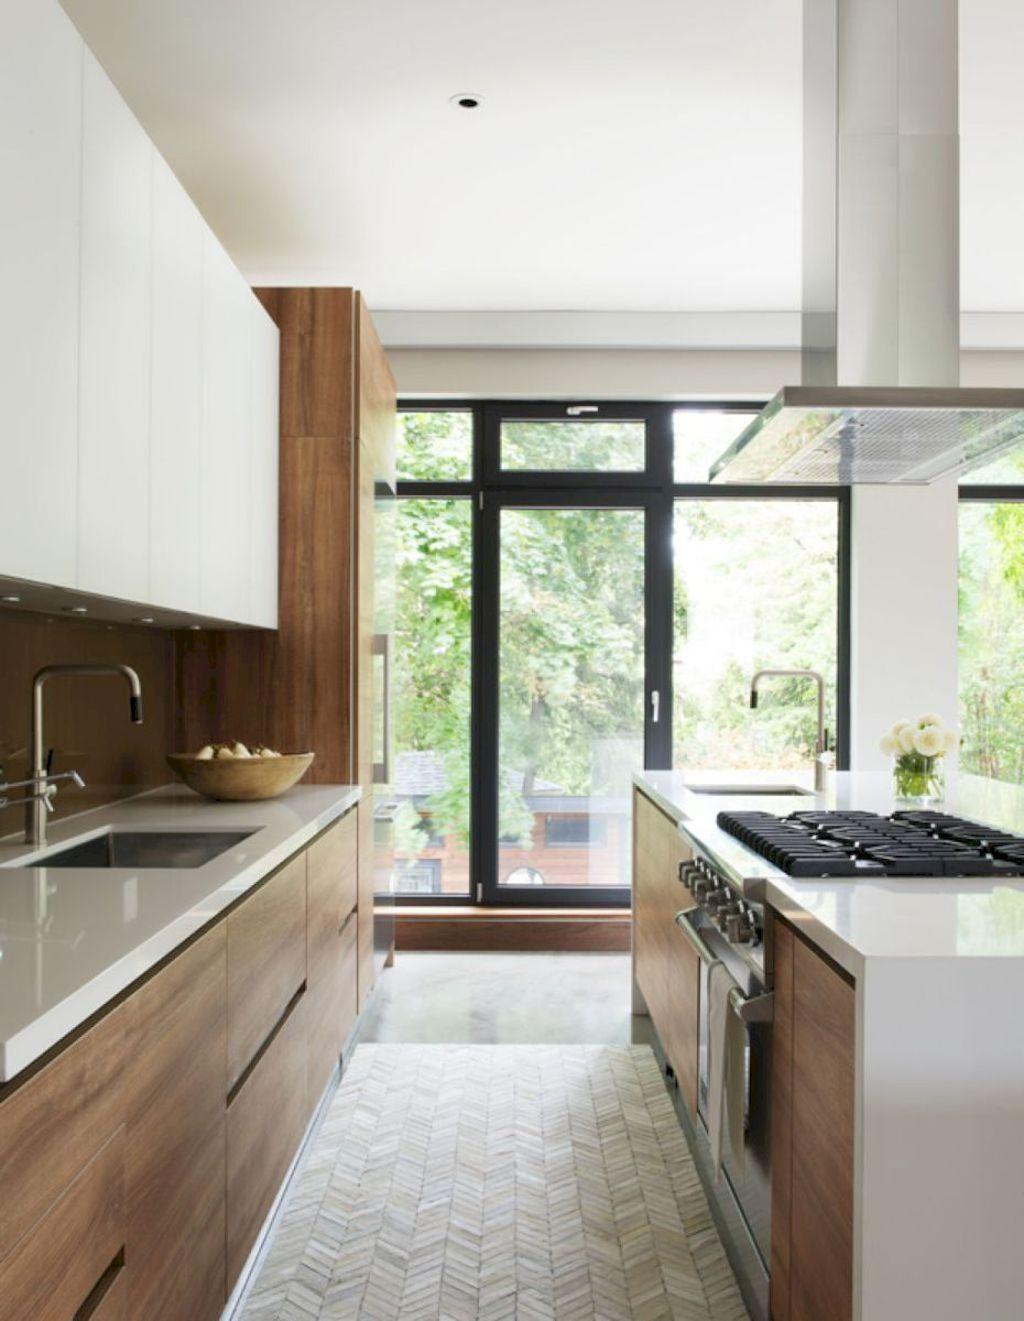 Gorgeous 70+ Small Apartment Kitchen Ideas On A Budget https